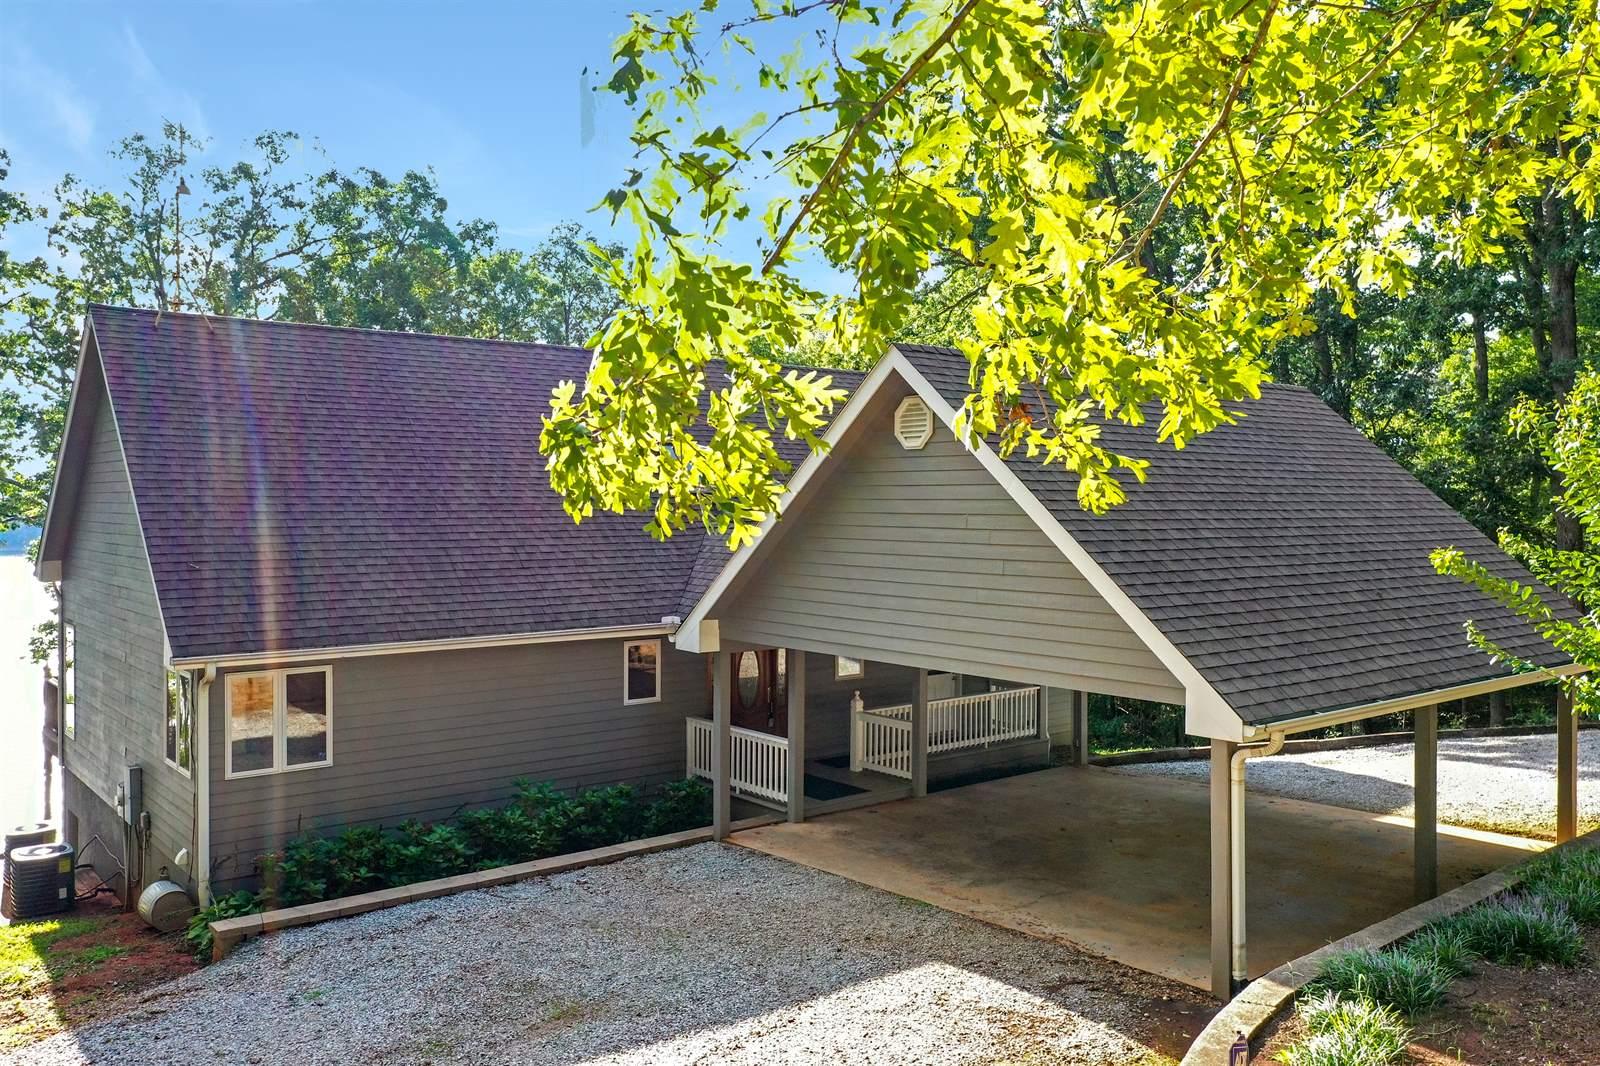 170 Lake Forest Rd., Bracey, VA 23919